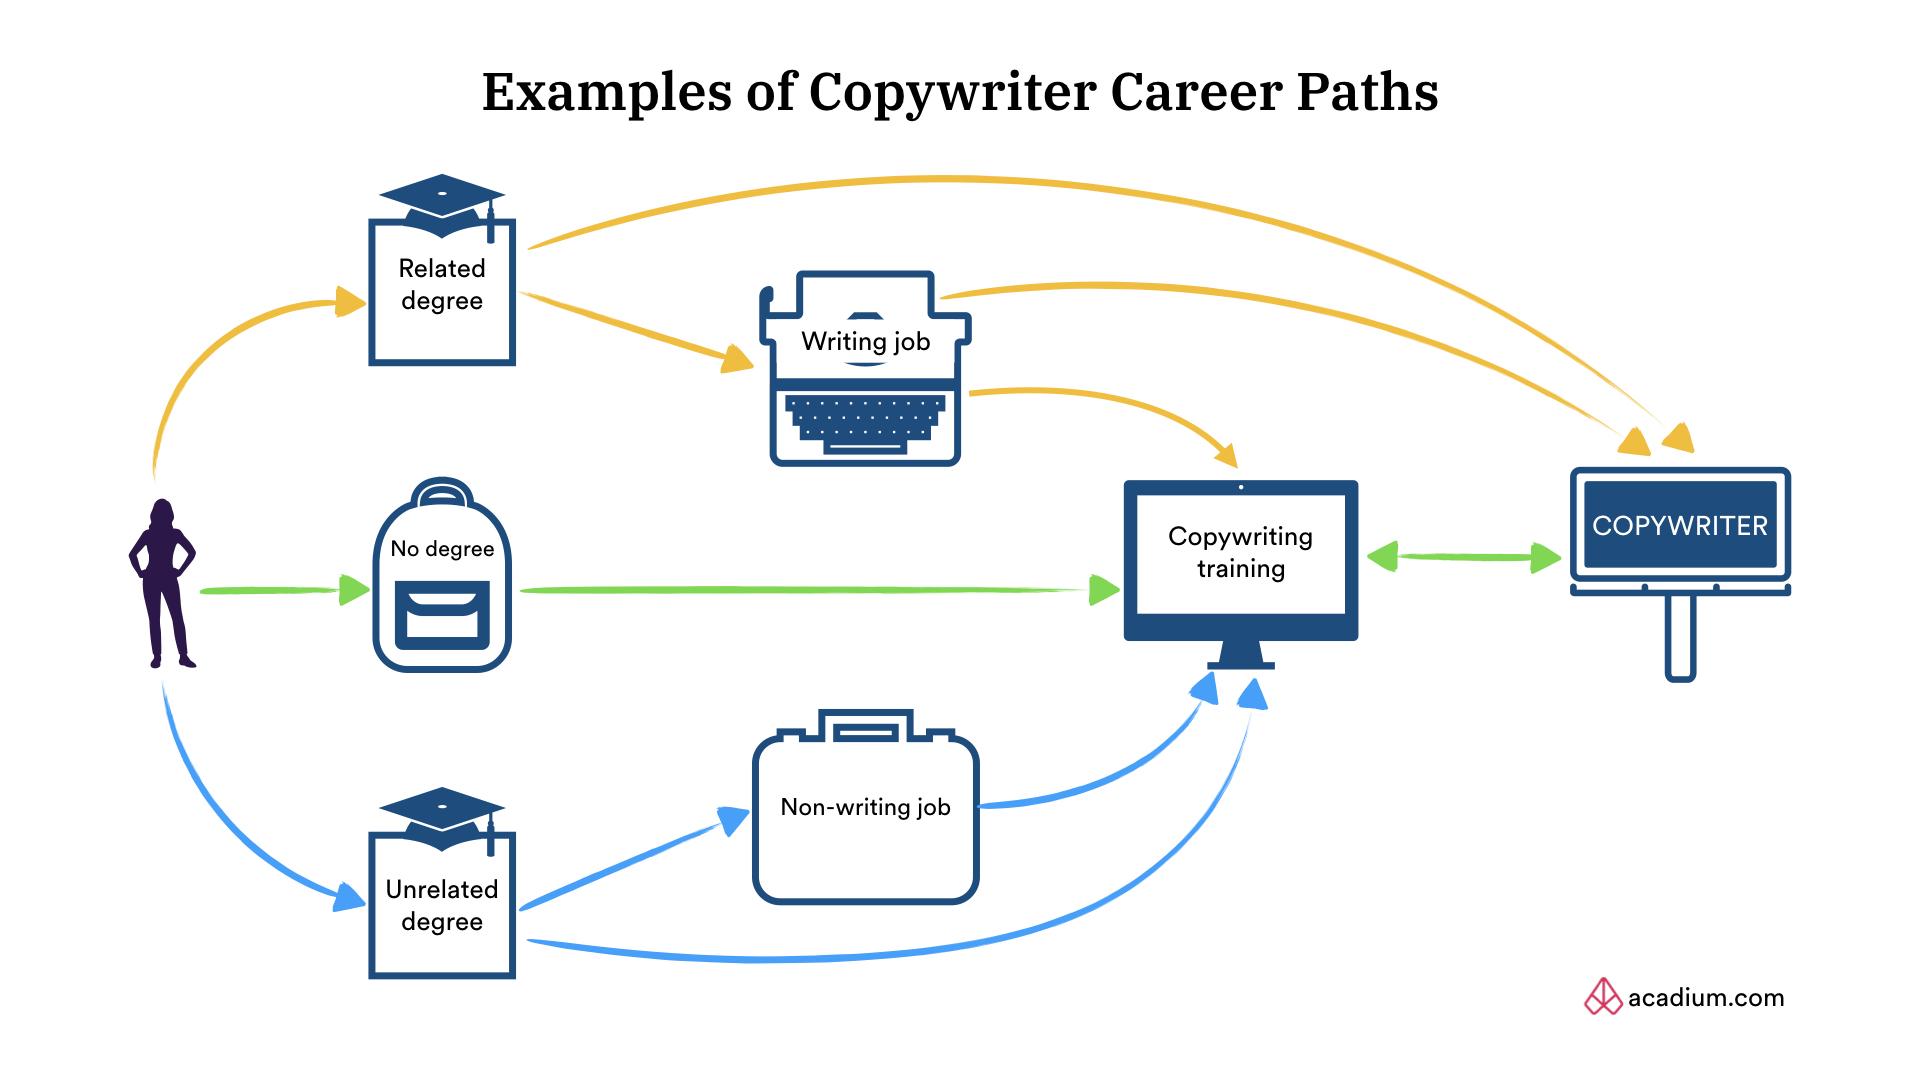 Copywriter Career Path Examples